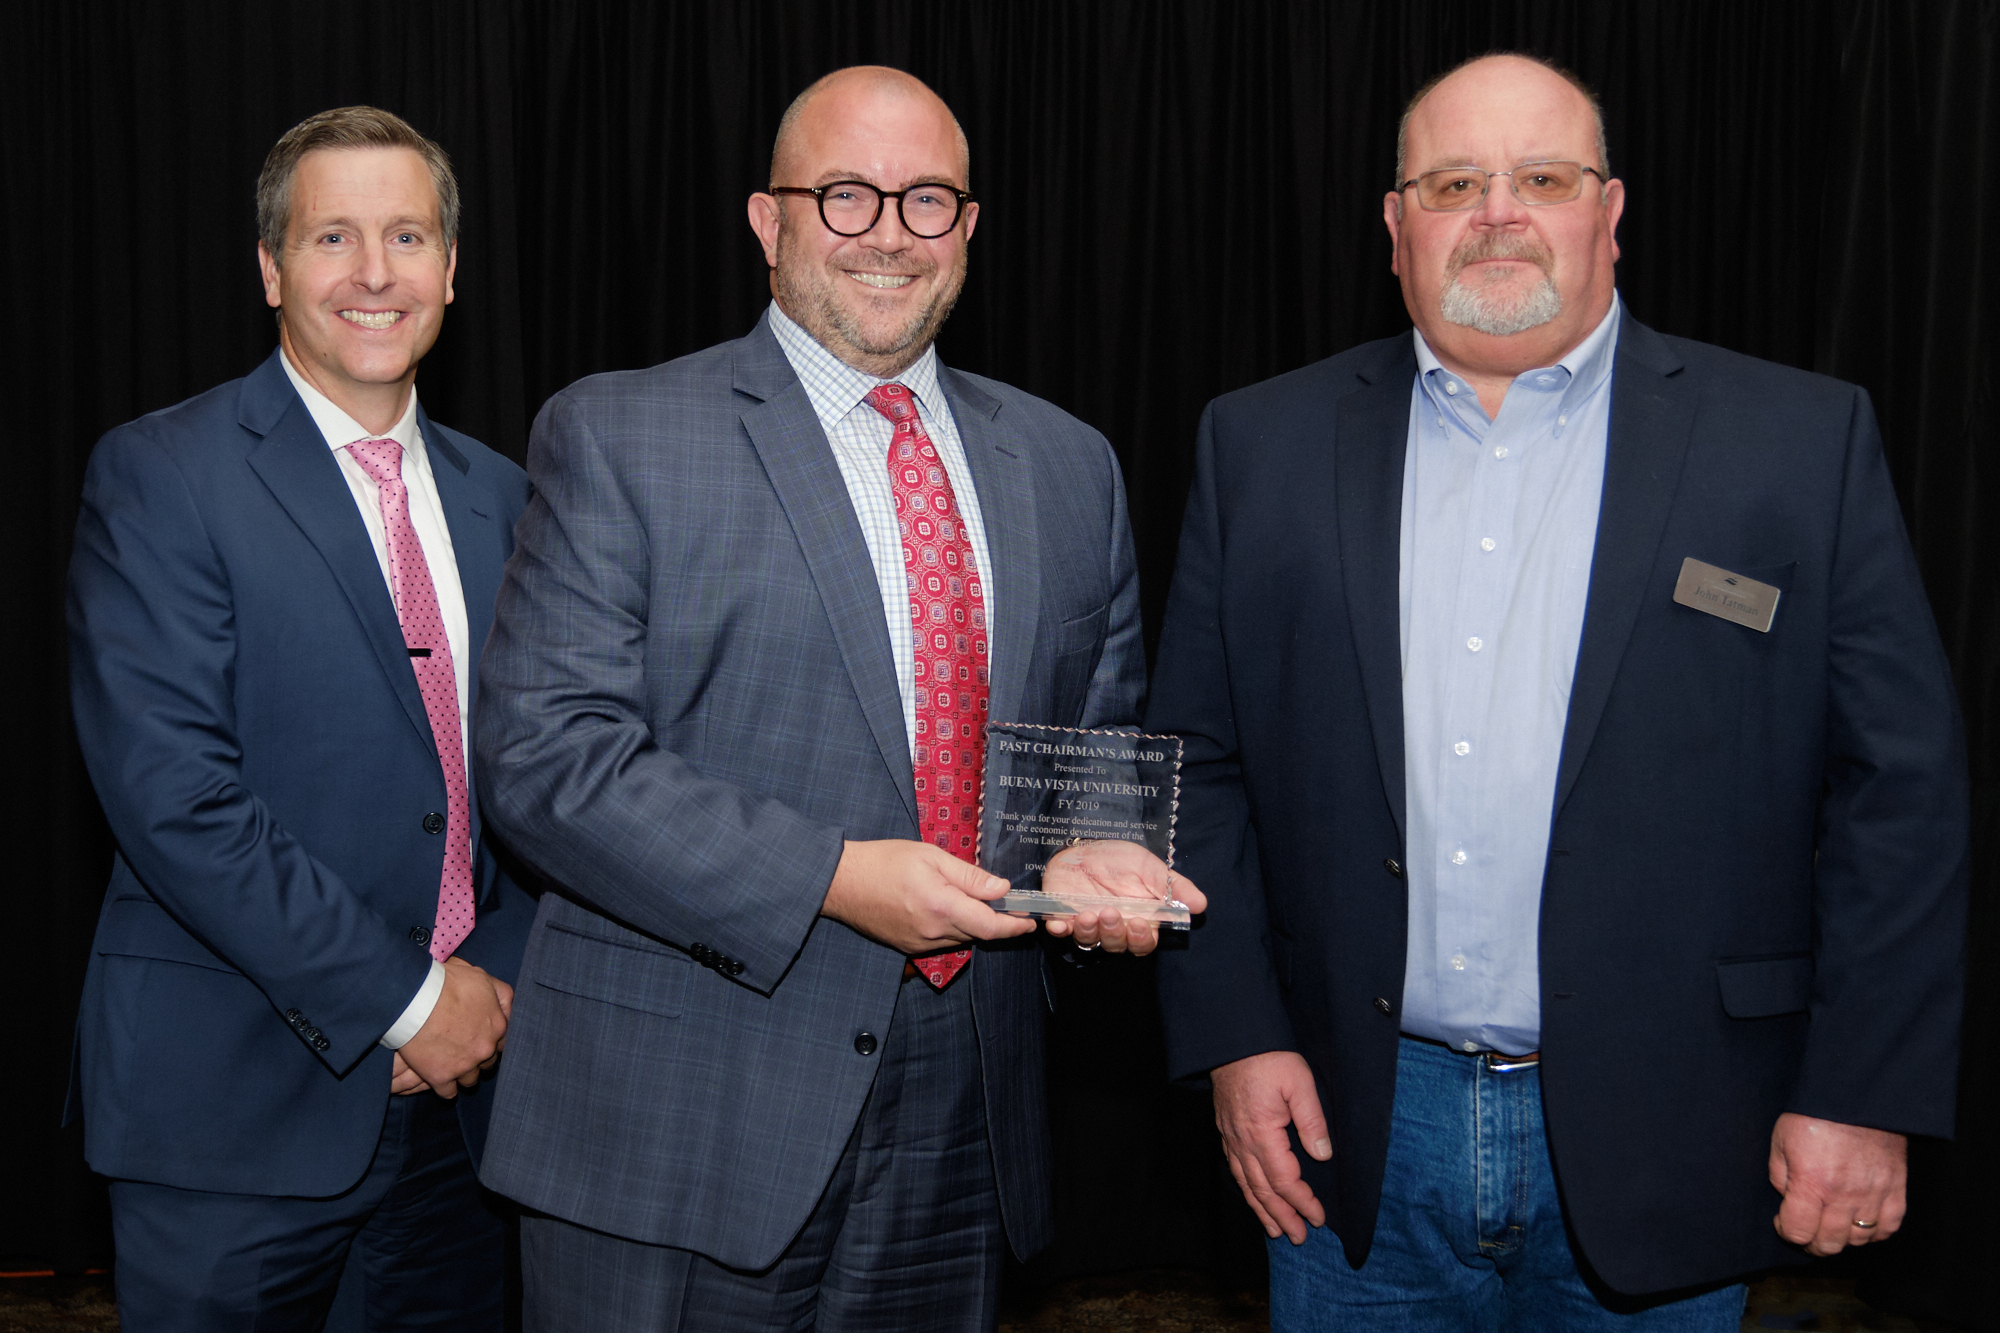 L to R: Corridor CEO Kiley Miller, Dr. Joshua Merchant of Buena Vista University - 2019 Chairman's Award Winner, Corridor Board Chair John Tatman